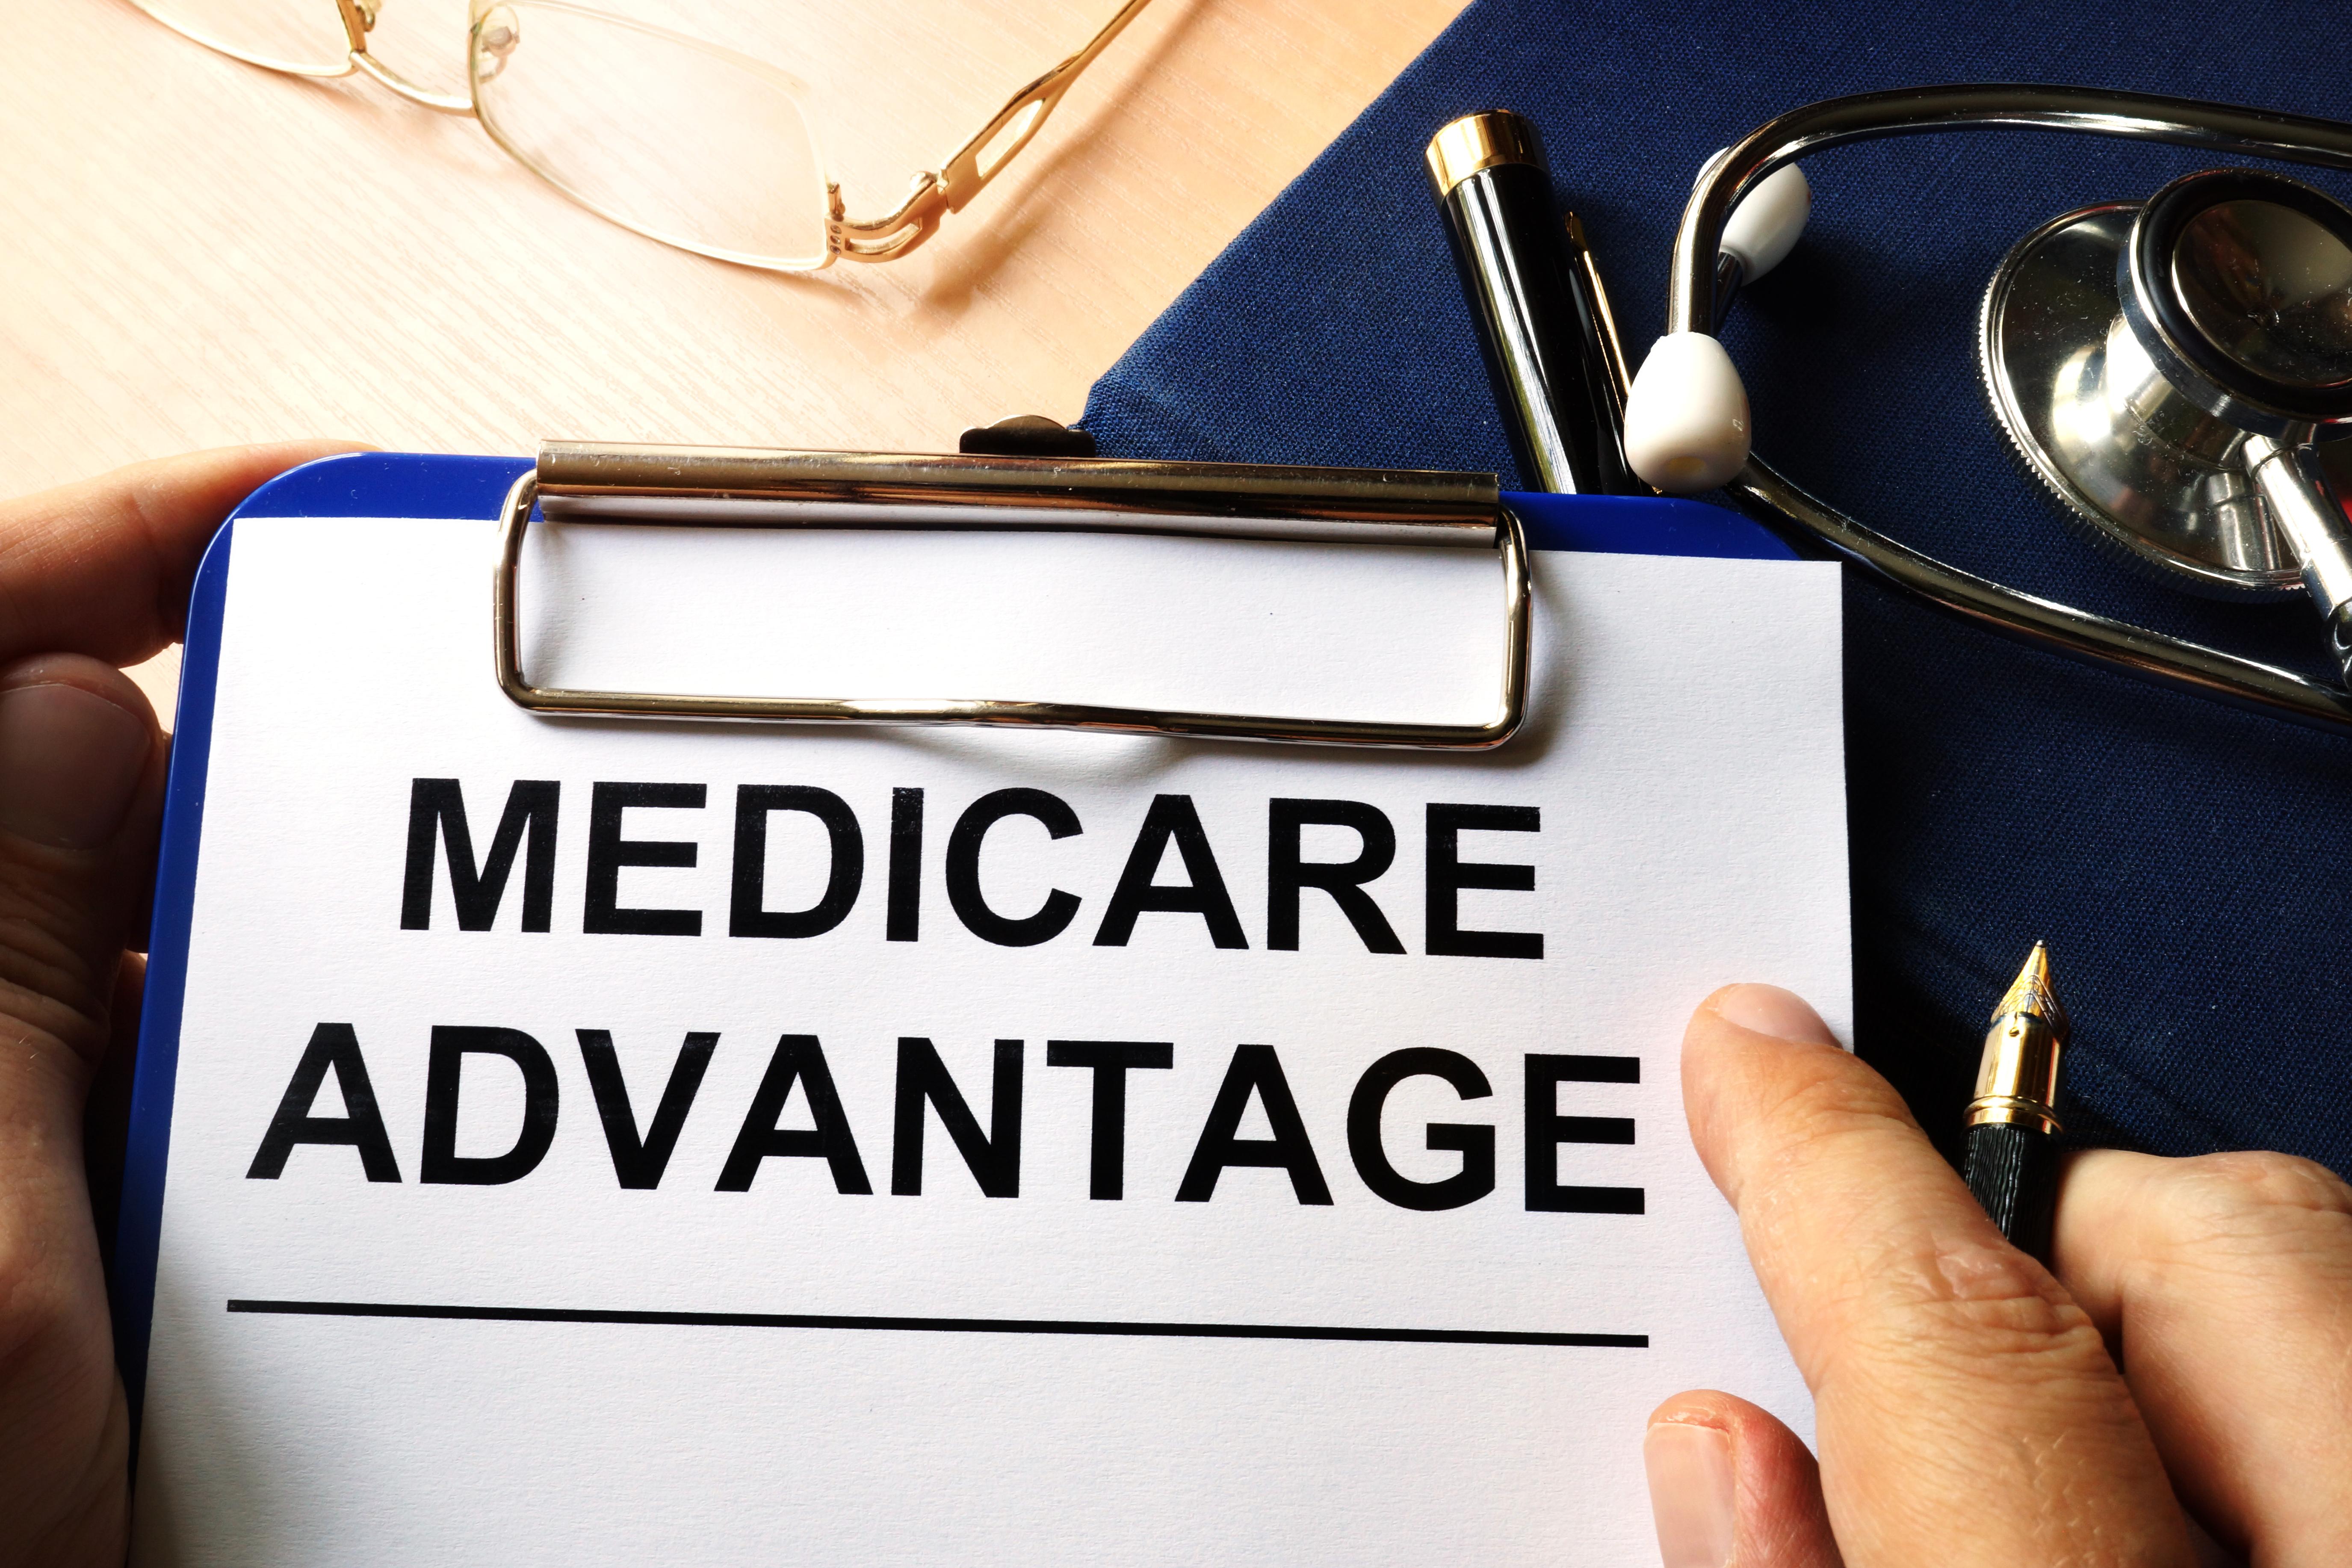 eHealth: Medicare Advantage premiums drop 33% during latest